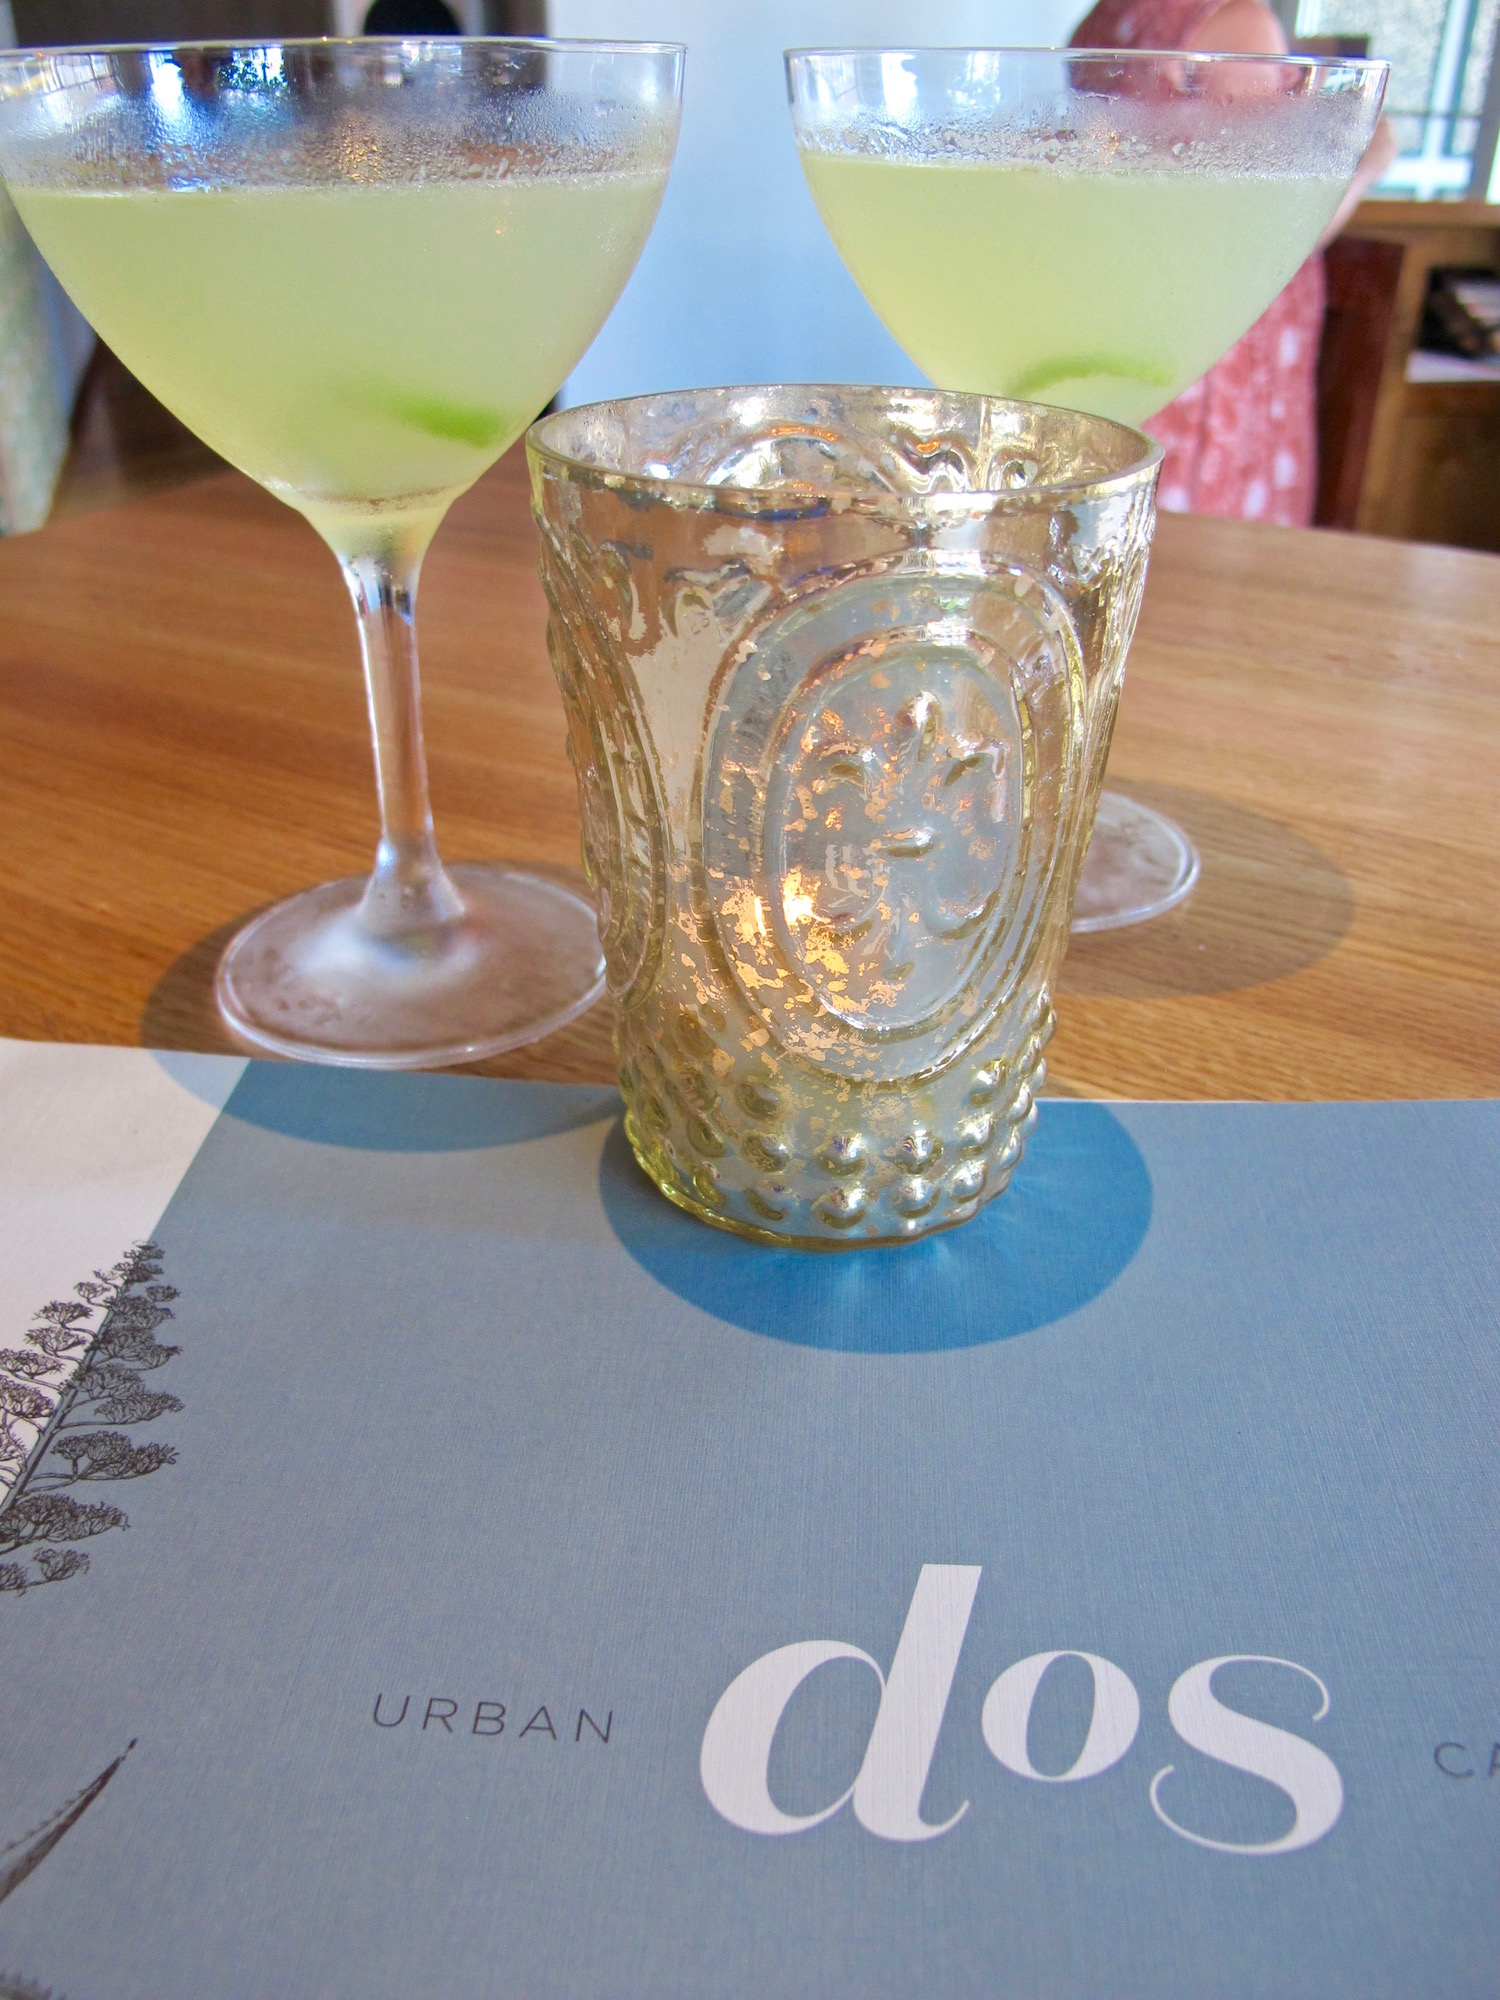 Dos urban cocktails.jpg